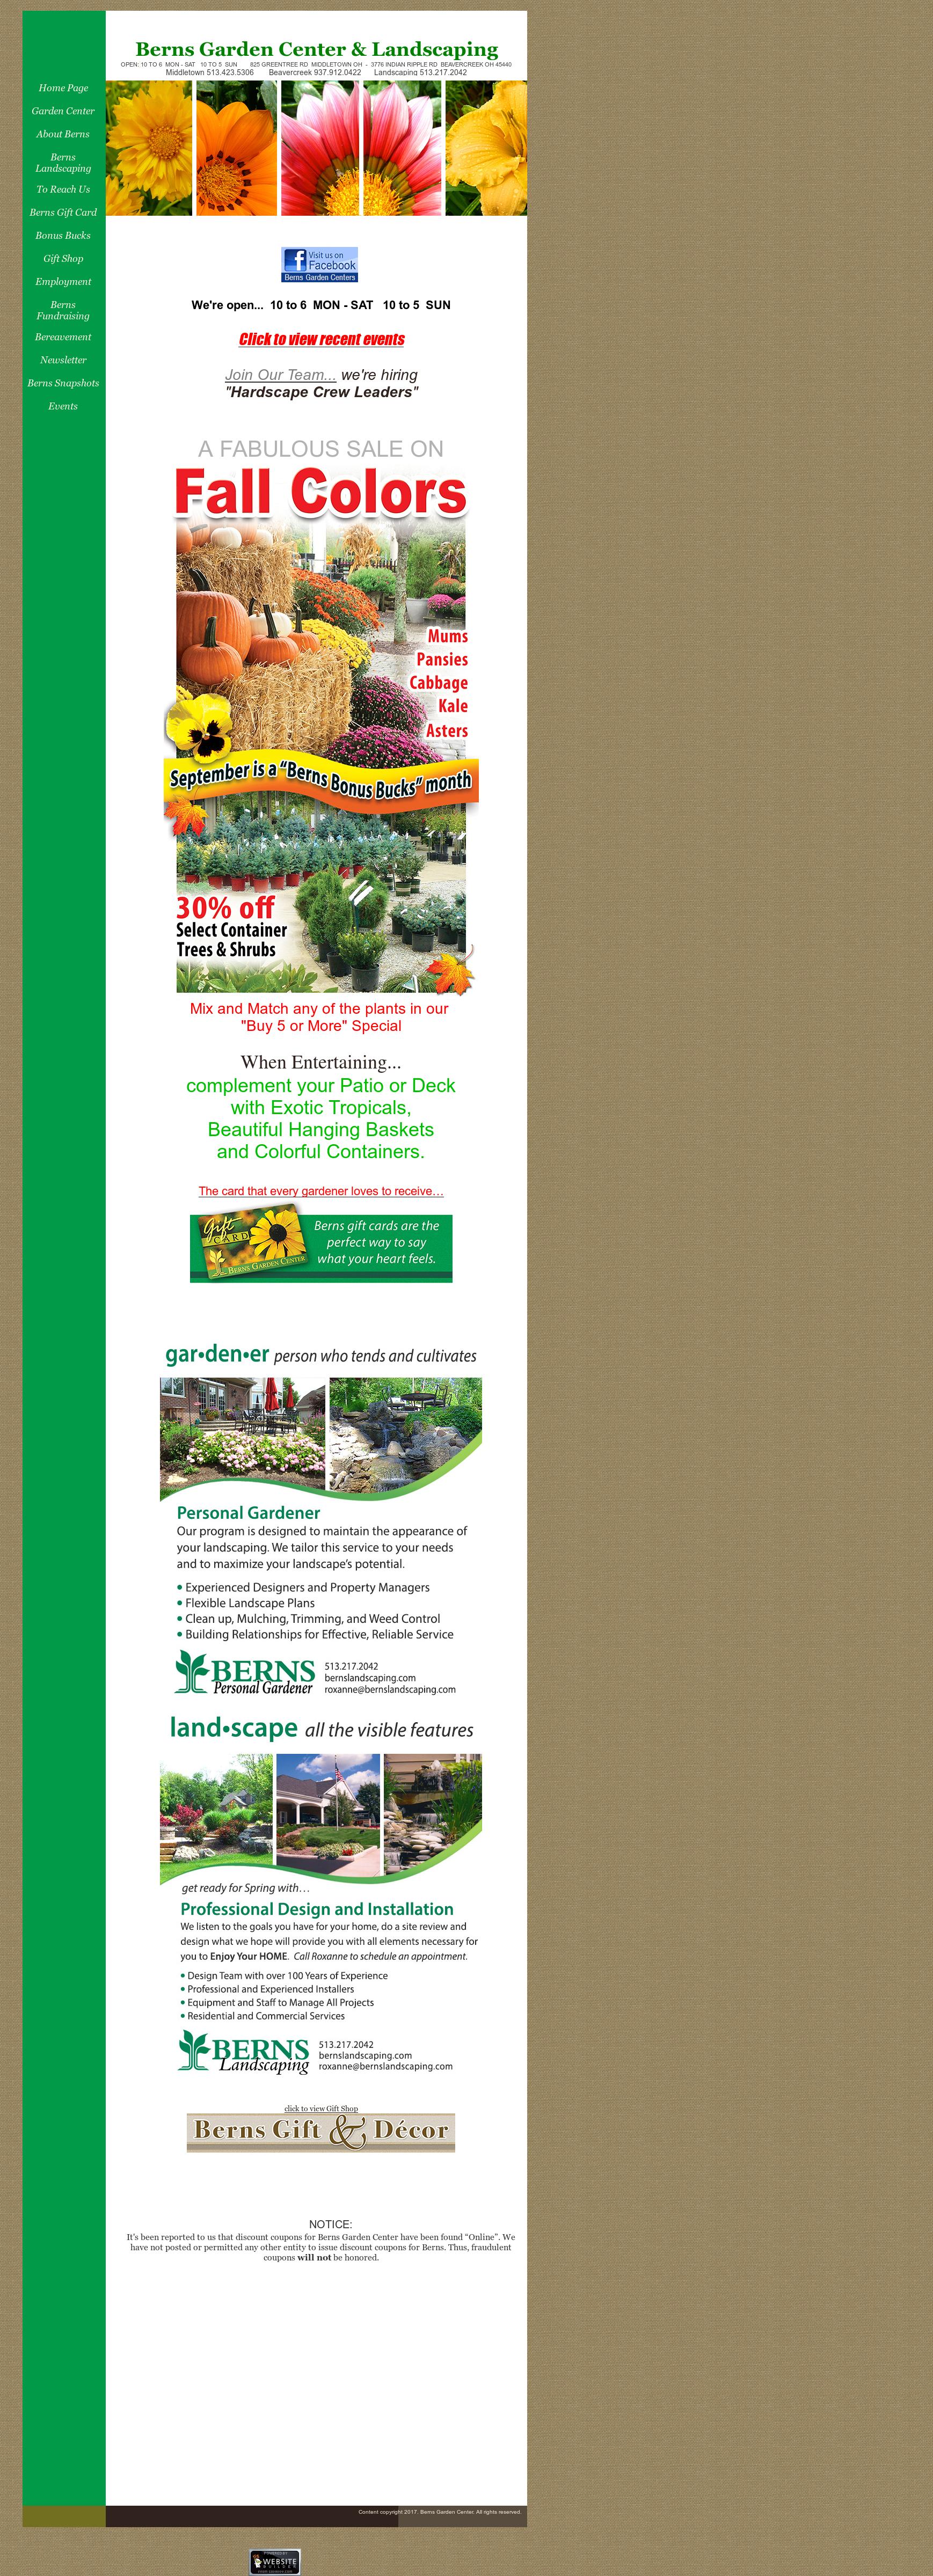 Merveilleux Berns Garden Center Competitors, Revenue And Employees ...